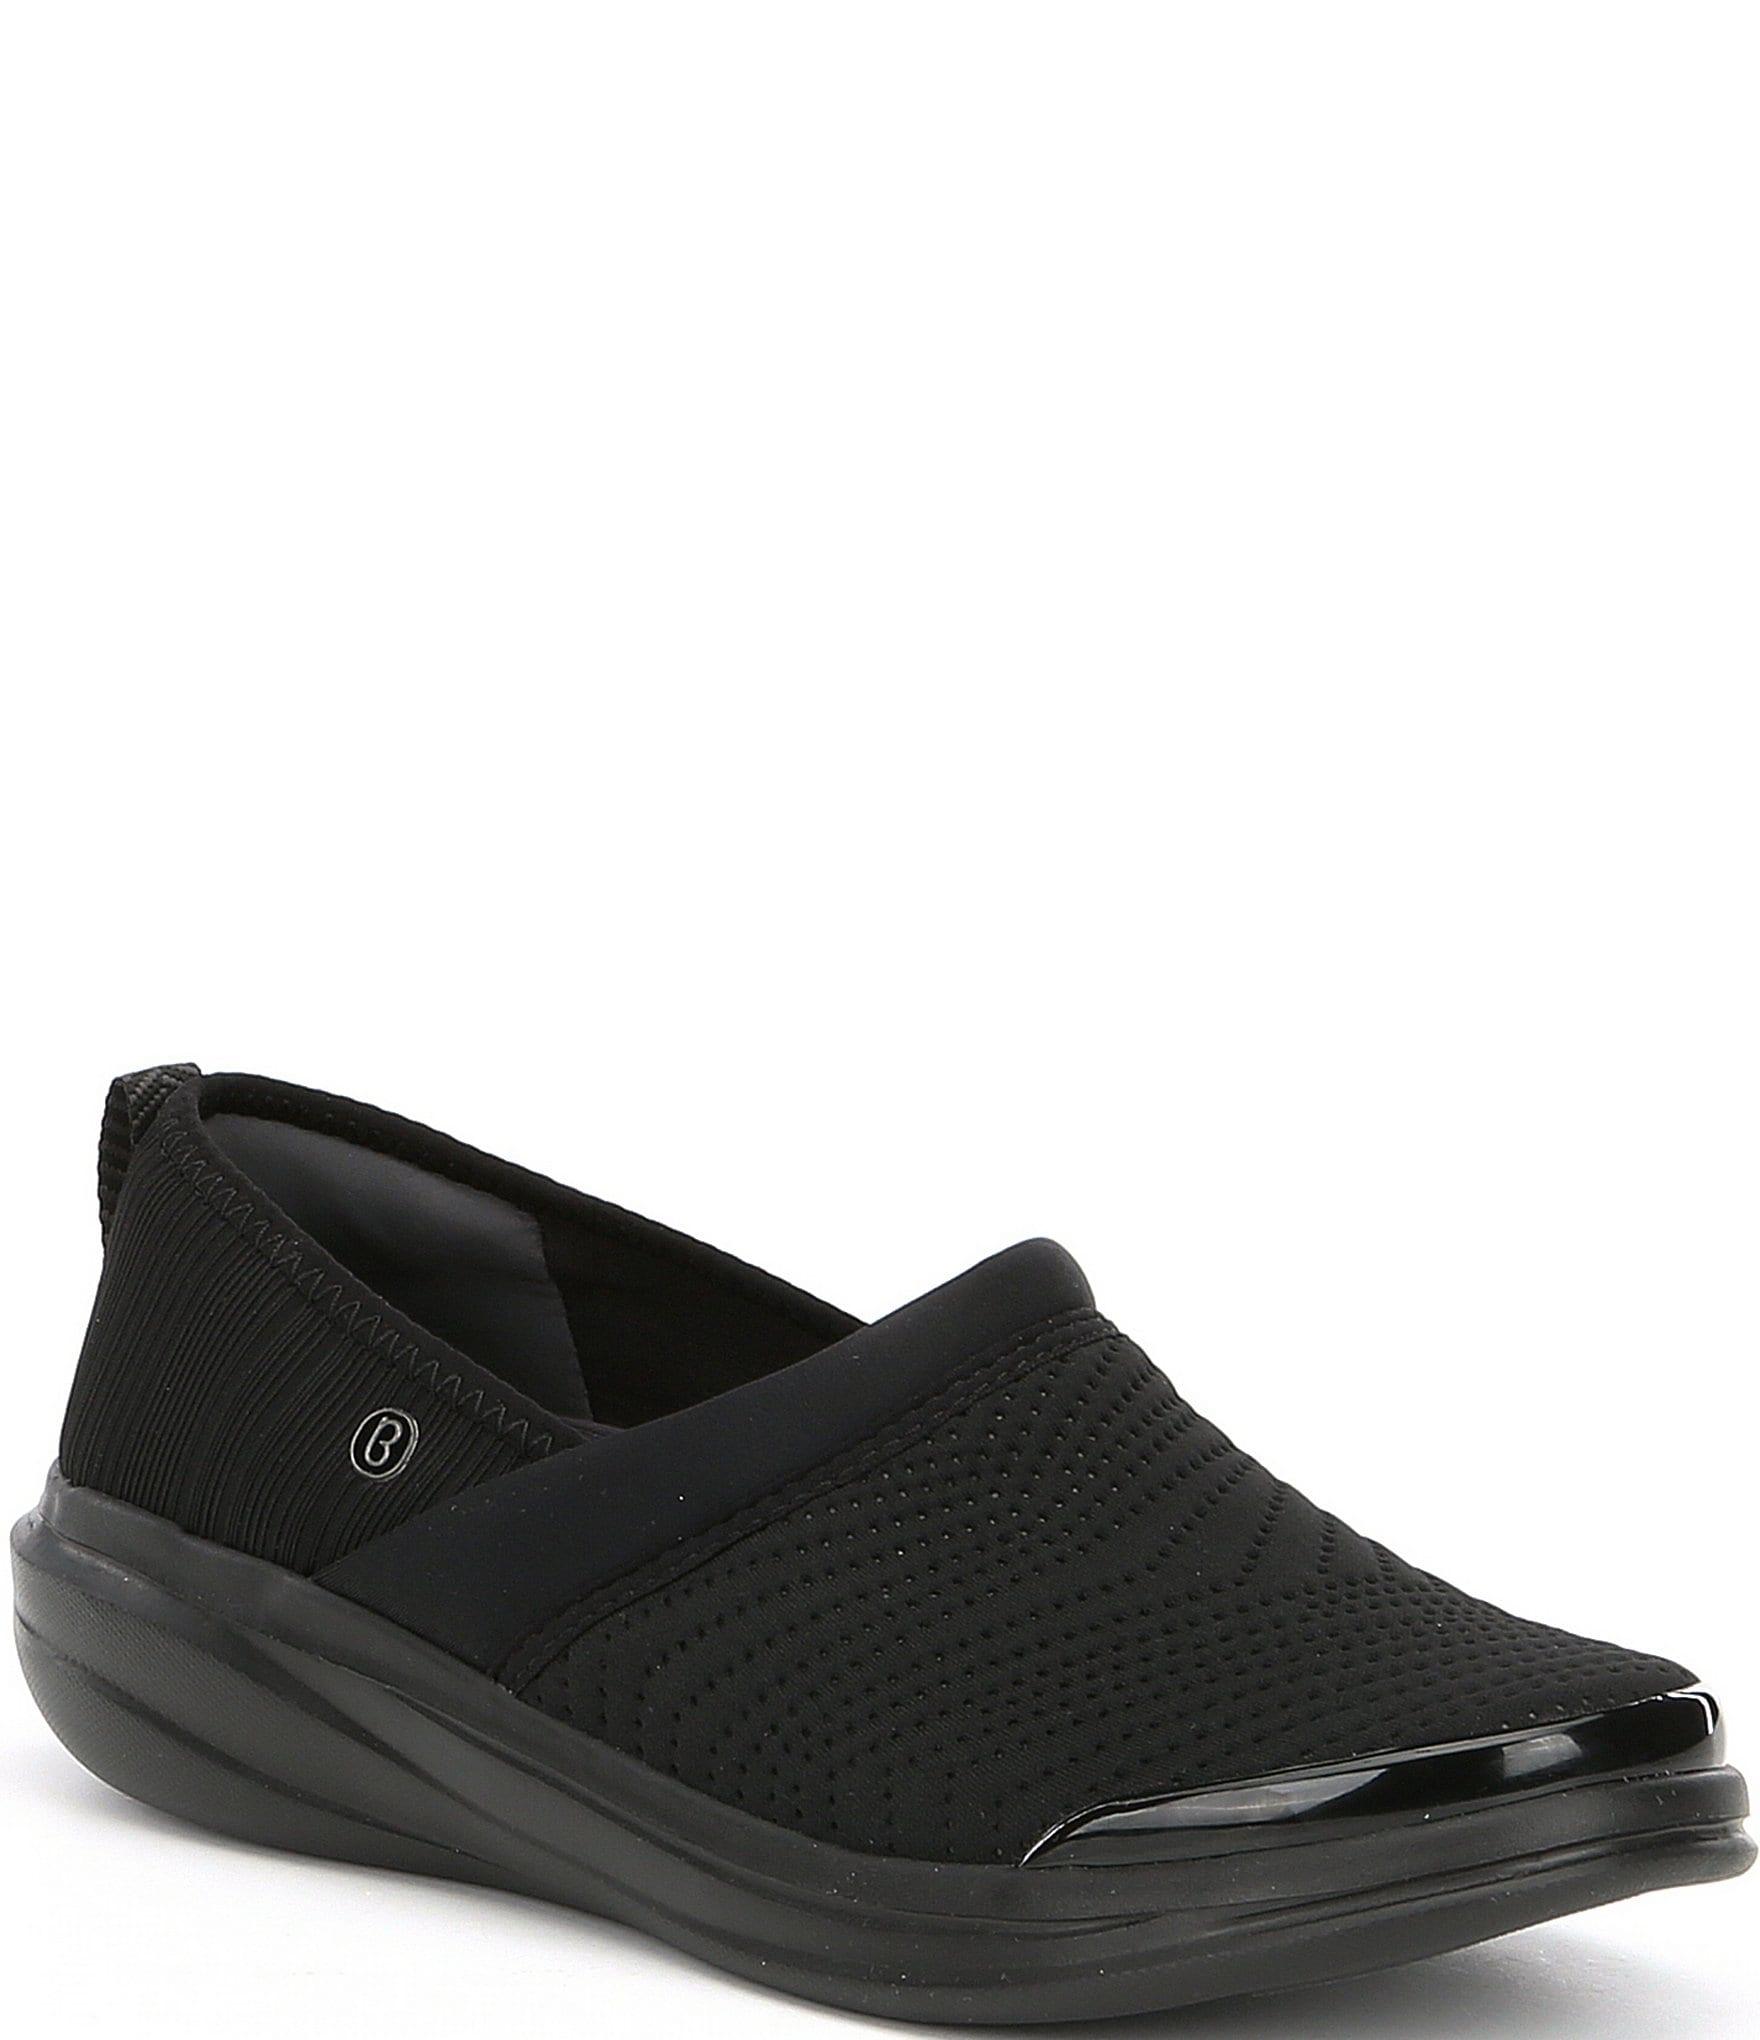 Bzees Coco Slip-On Sneakers | Dillard's